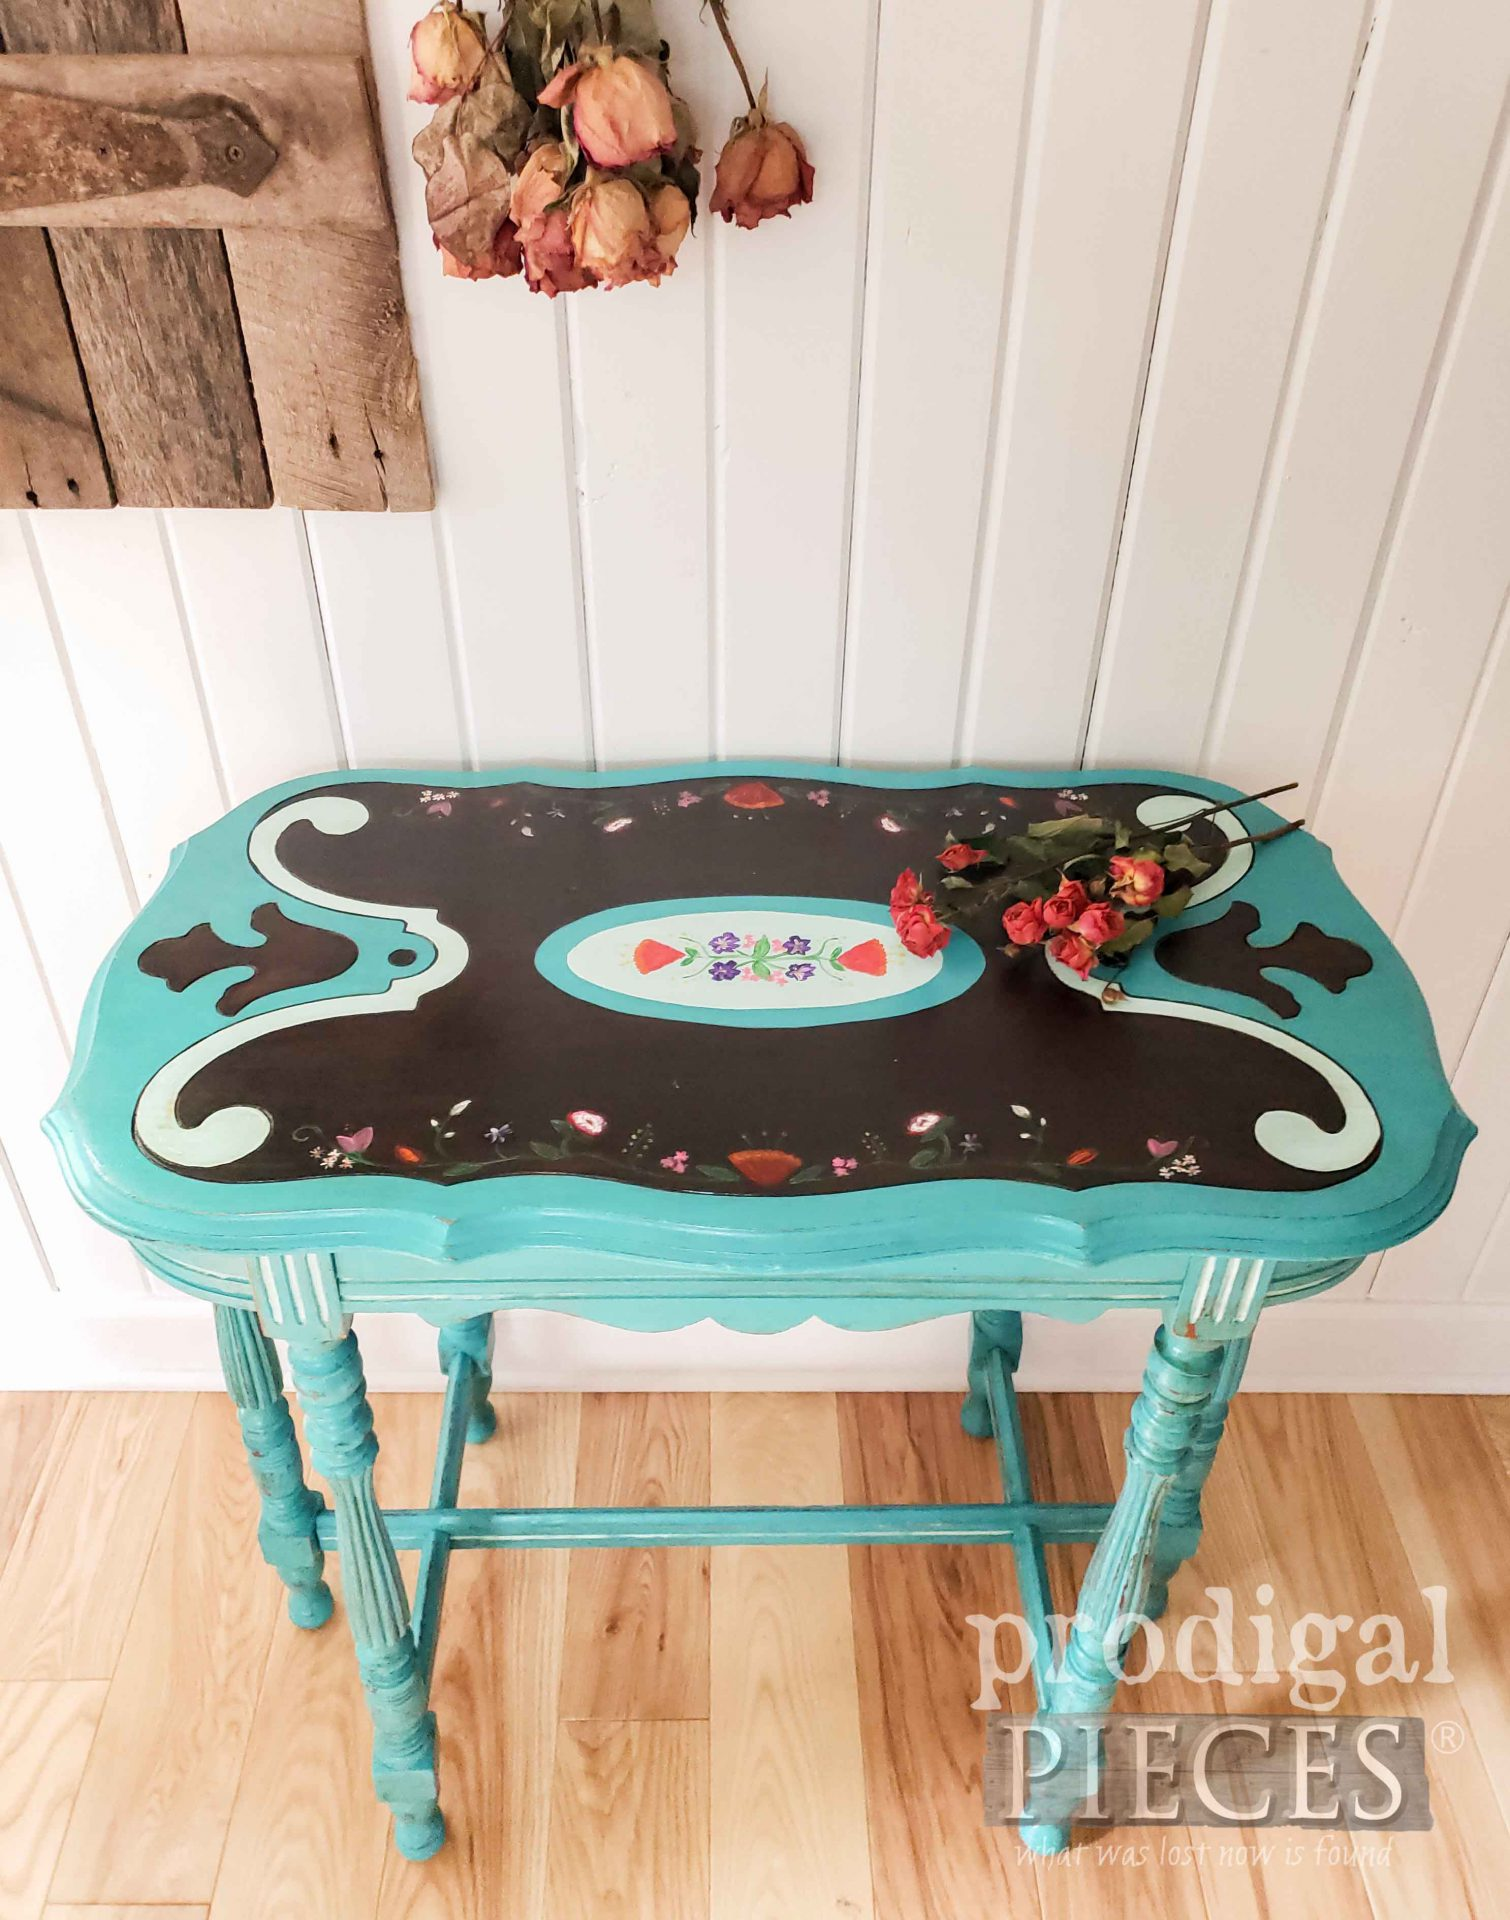 Aqua Blue Antique Table with Floral Motif by Larissa of Prodigal Pieces | prodigalpieces.com #prodigalpieces #diy #furniture #home #homedecor